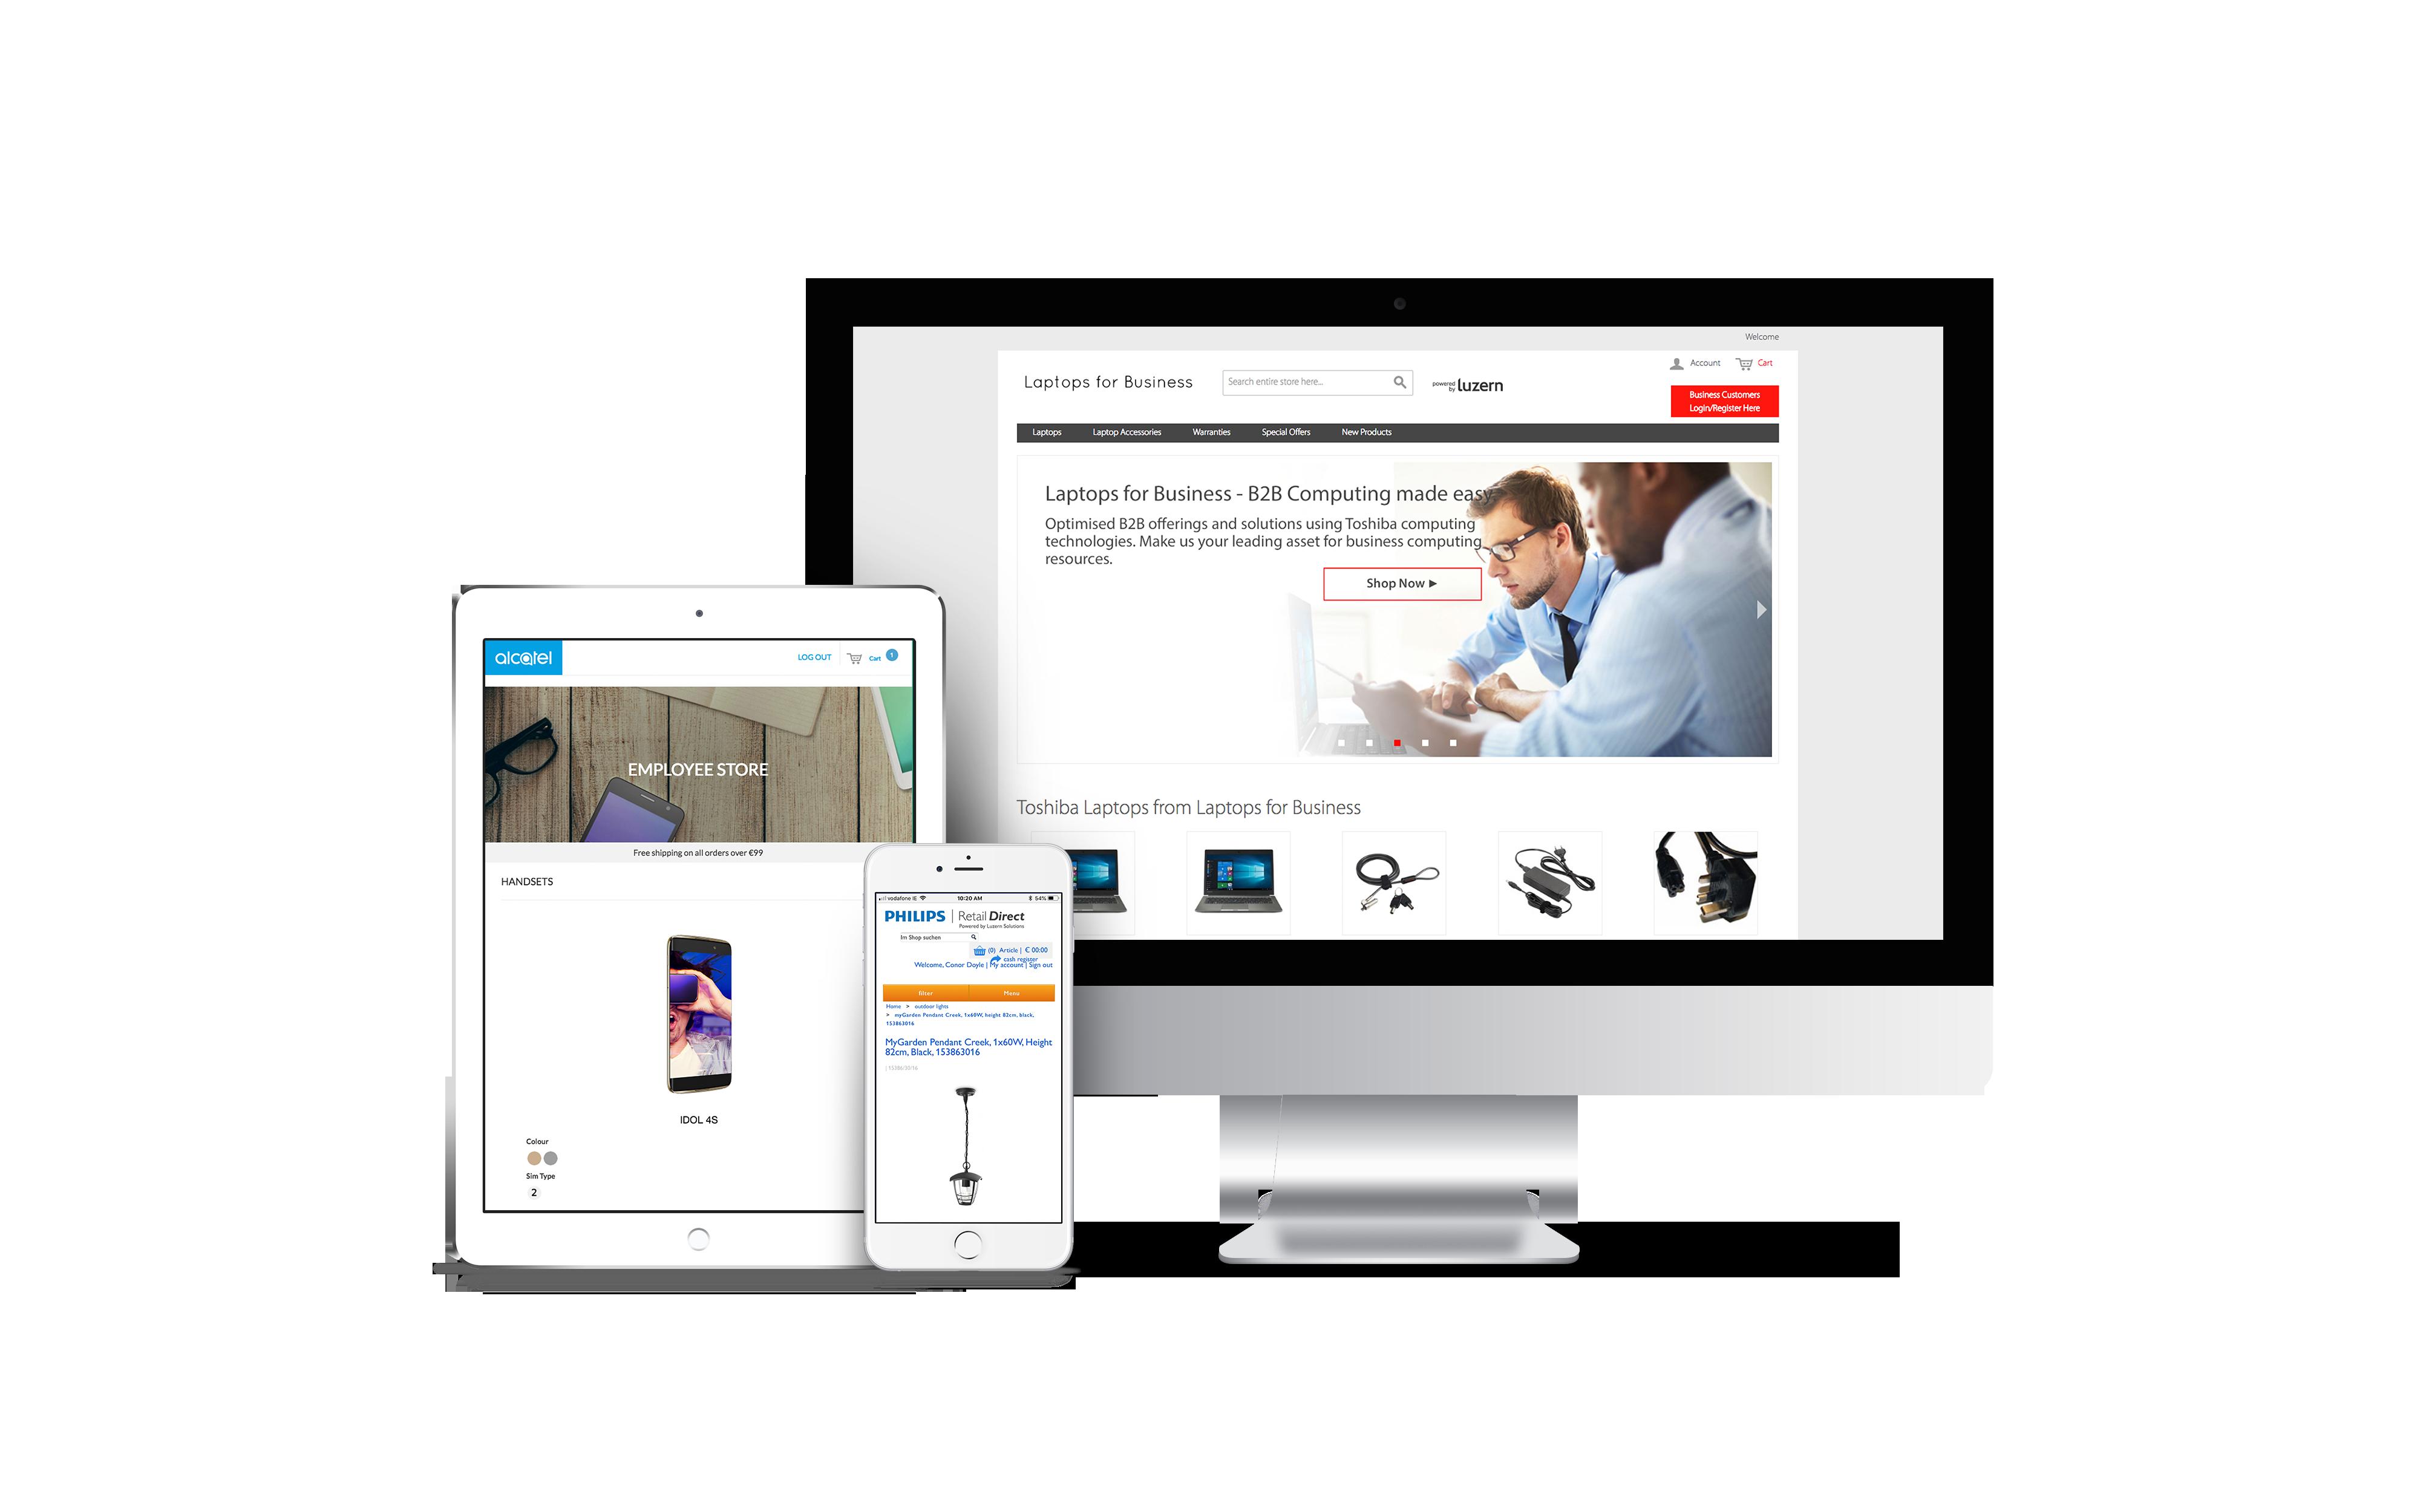 Multidevice-iPad-iPhone-iMac-B2B-Stores.png